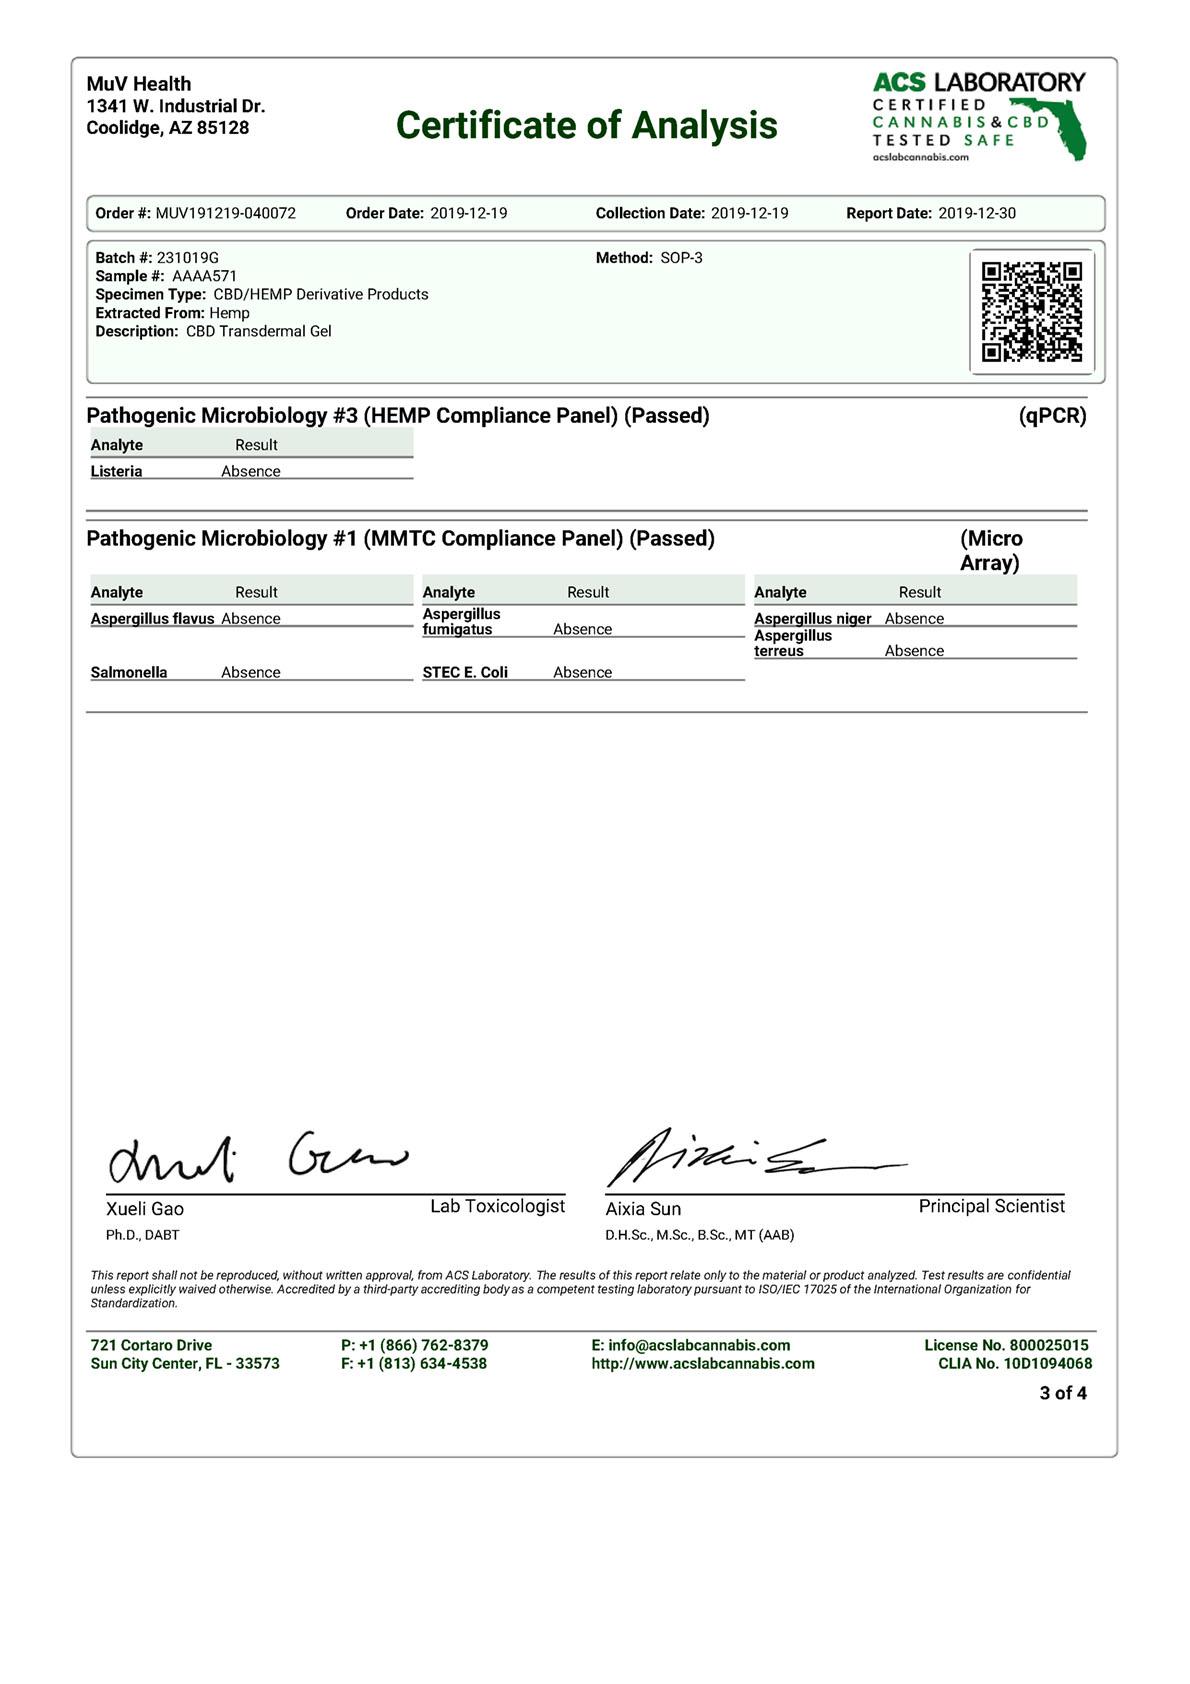 muv-cbd-transdermal-gel-coa-231019g-page-3.jpg